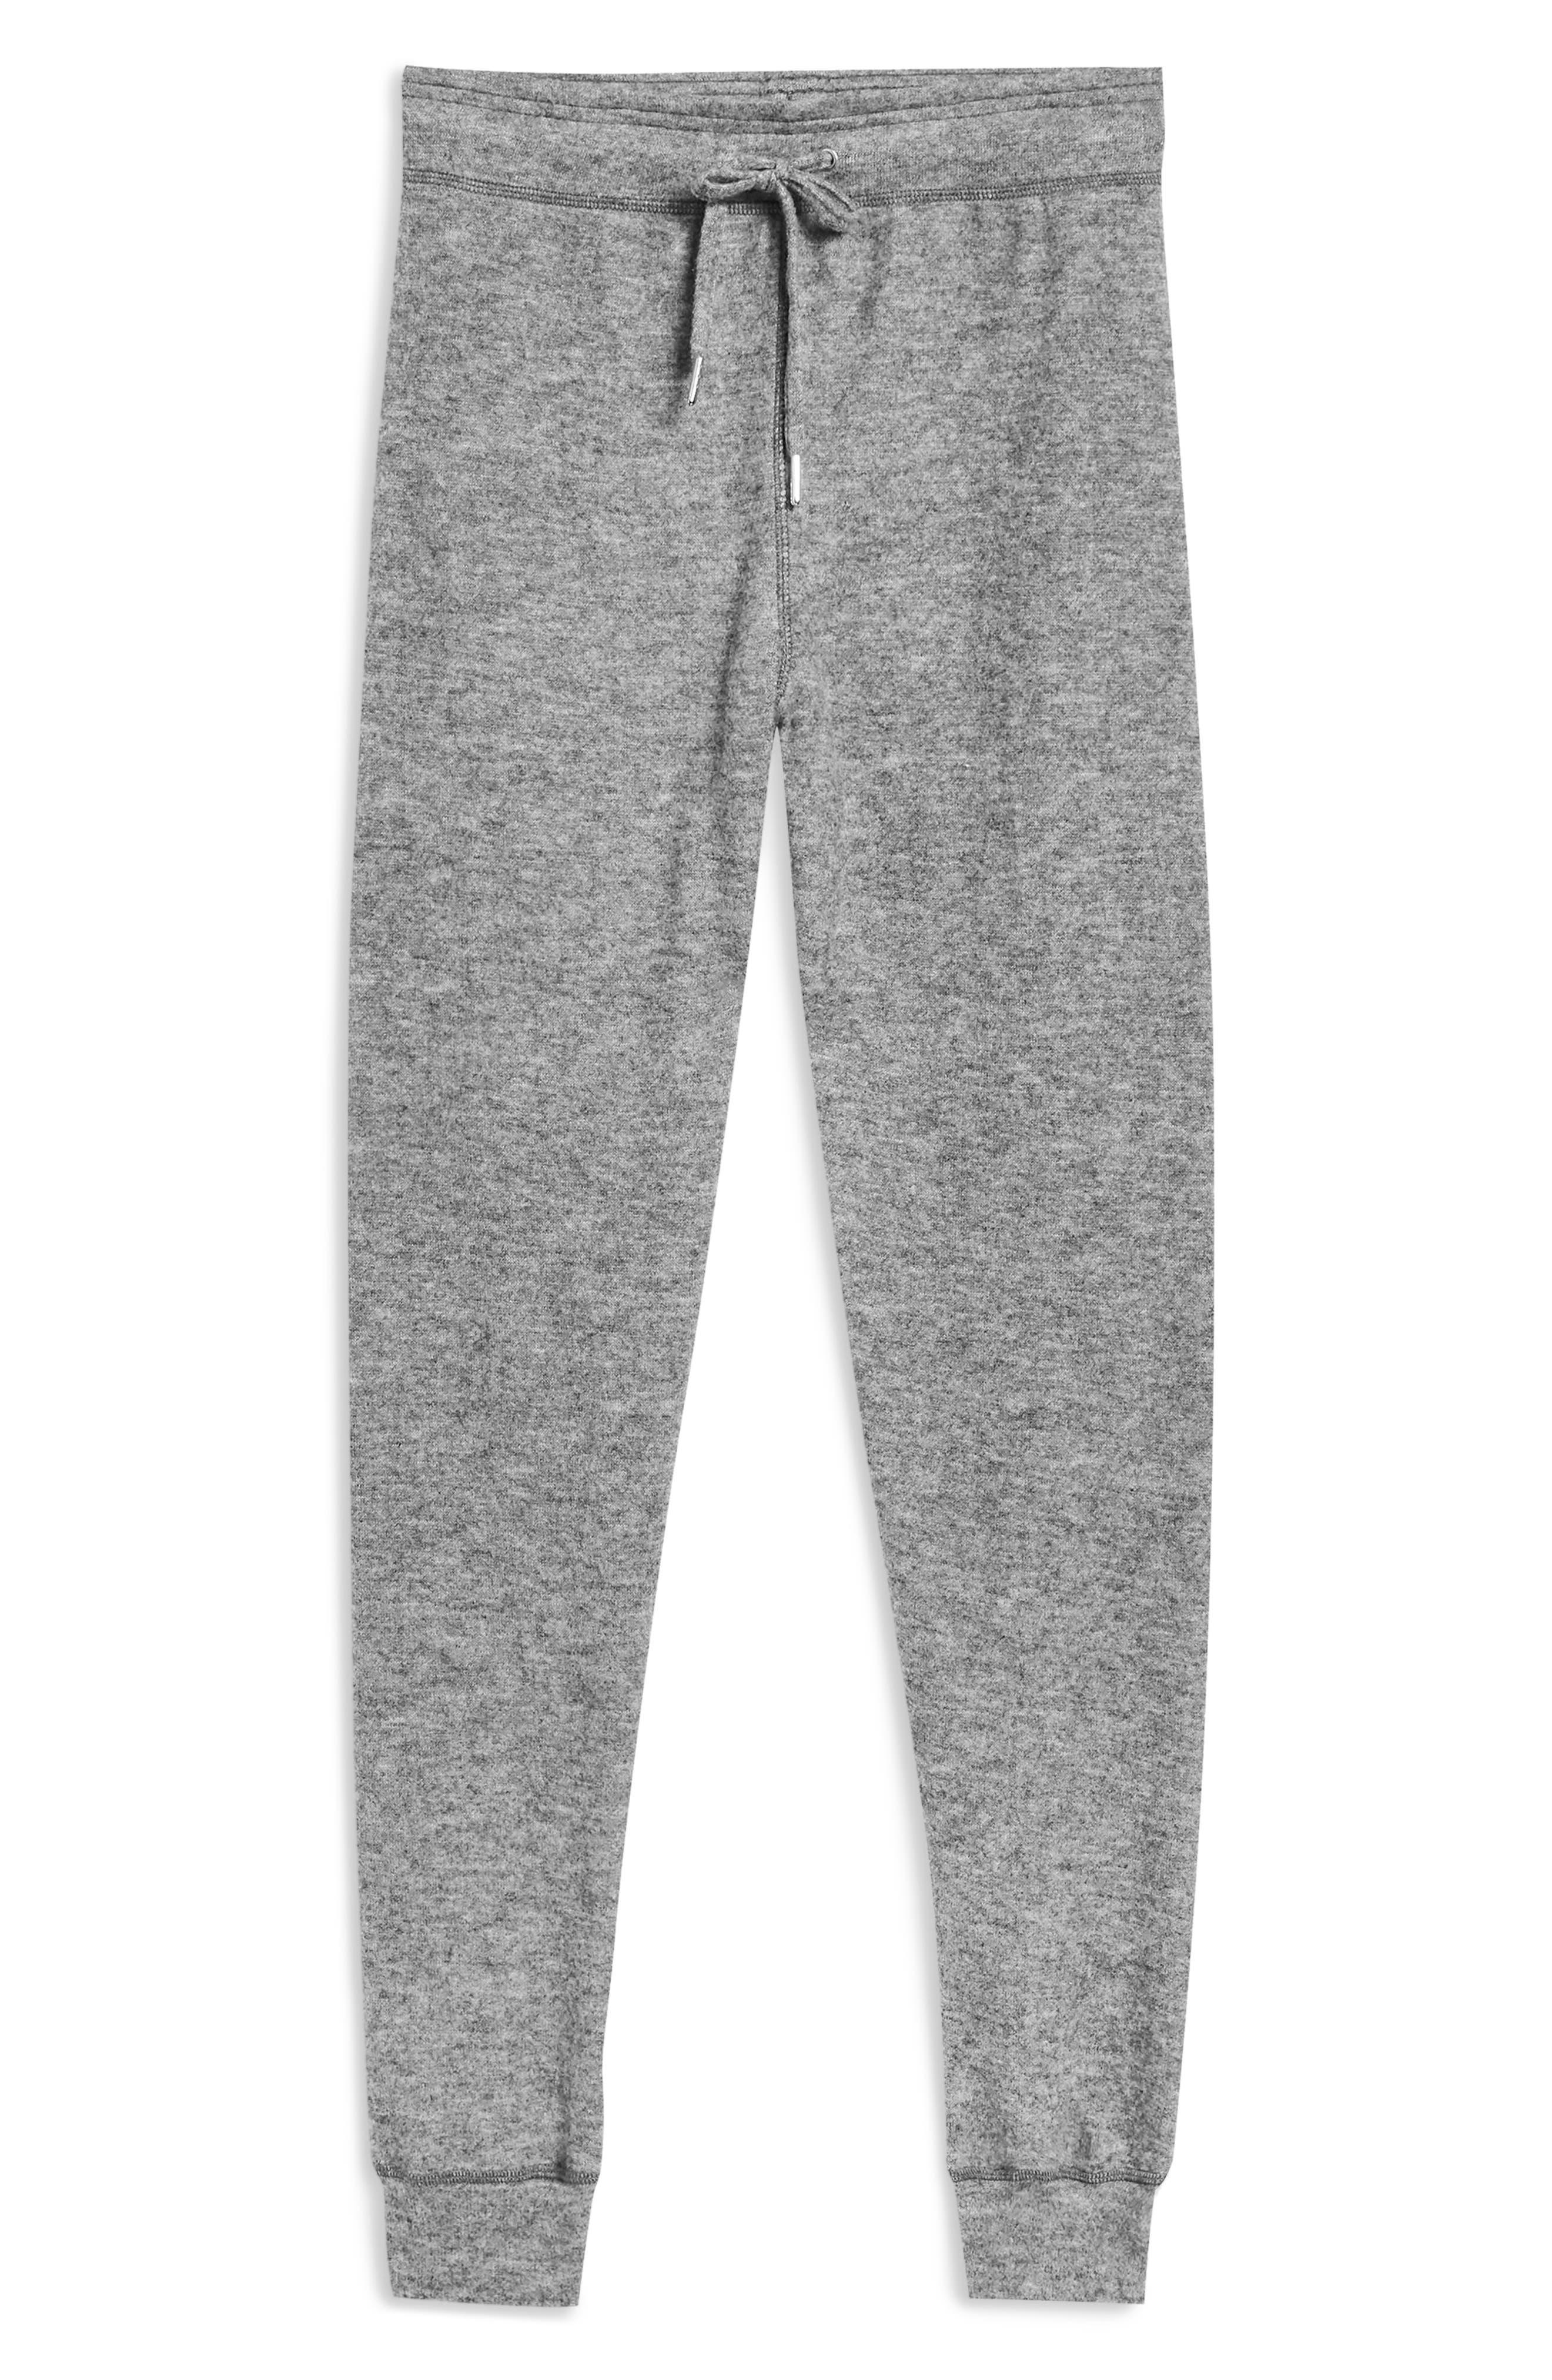 Brushed Super Skinny Jogger Pants,                             Alternate thumbnail 4, color,                             GREY MARL